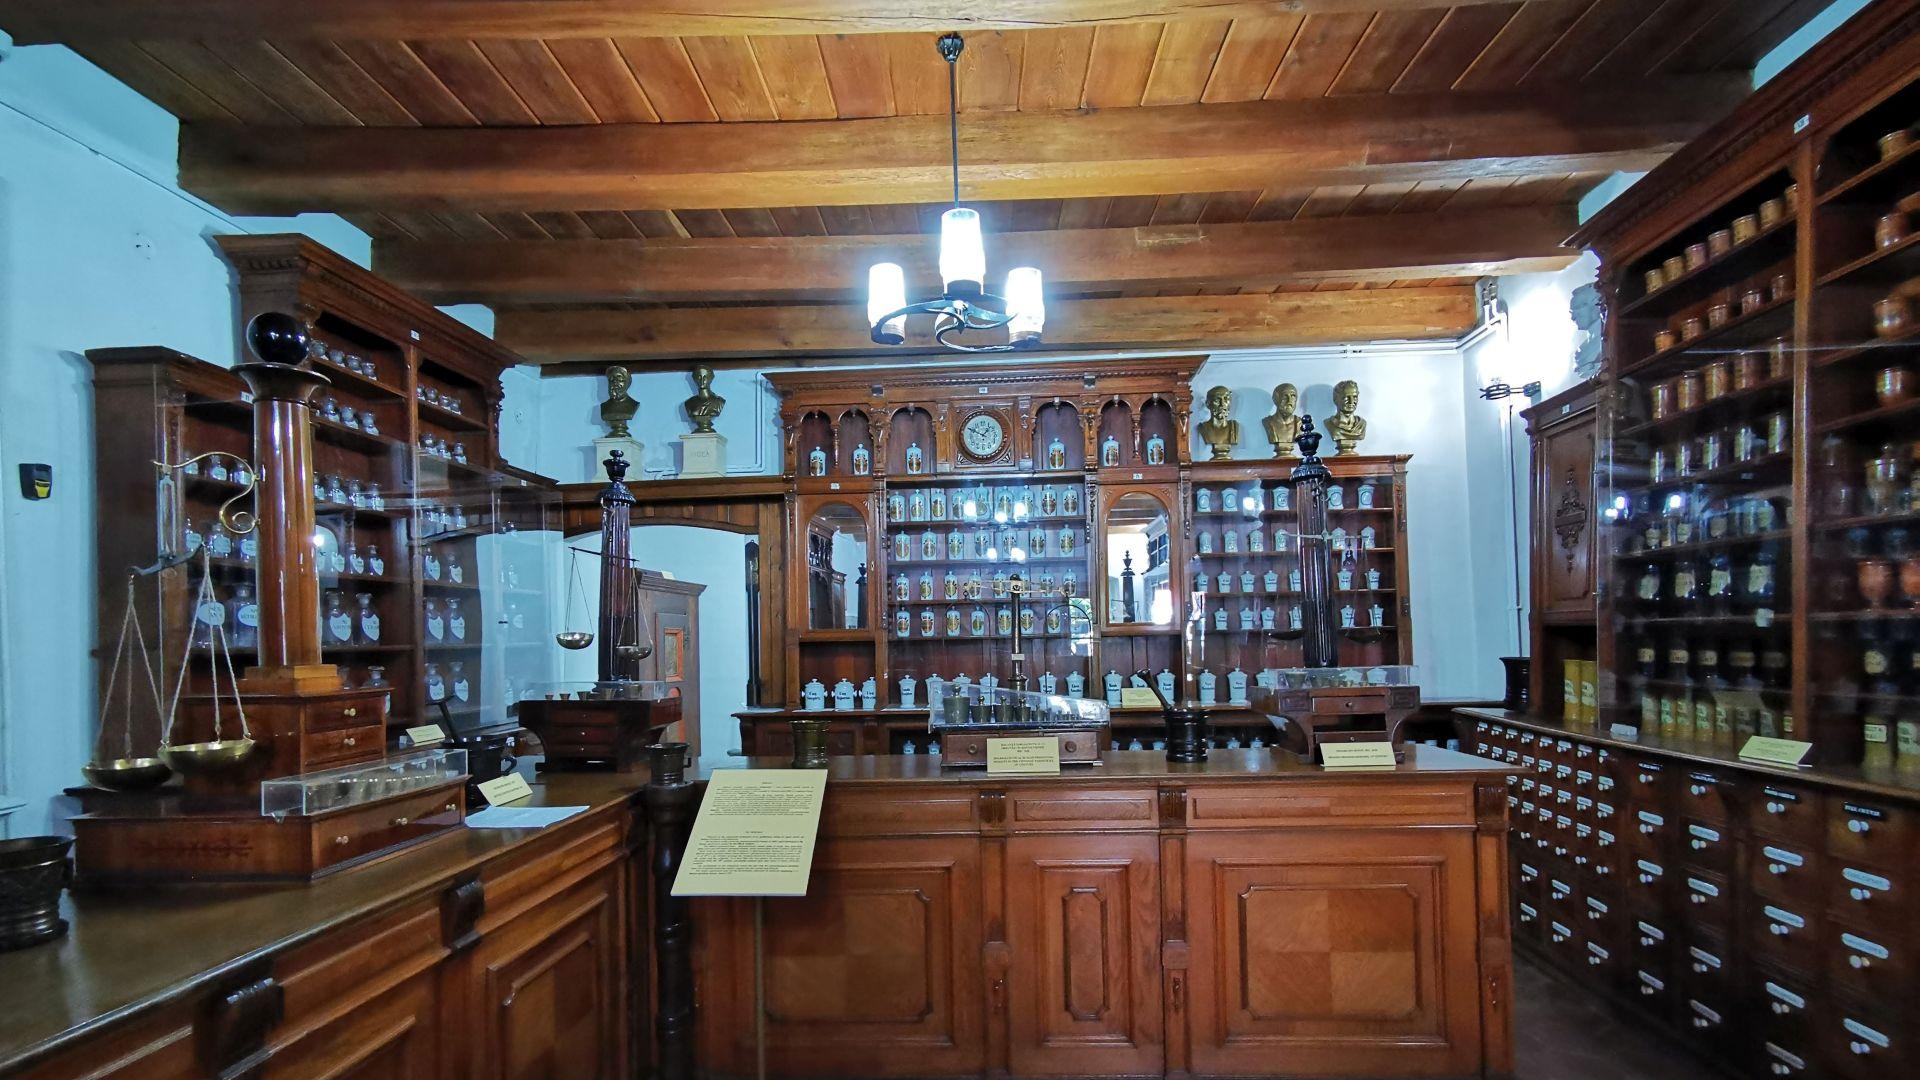 Muzeul Farmaciei, Sibiu - interior